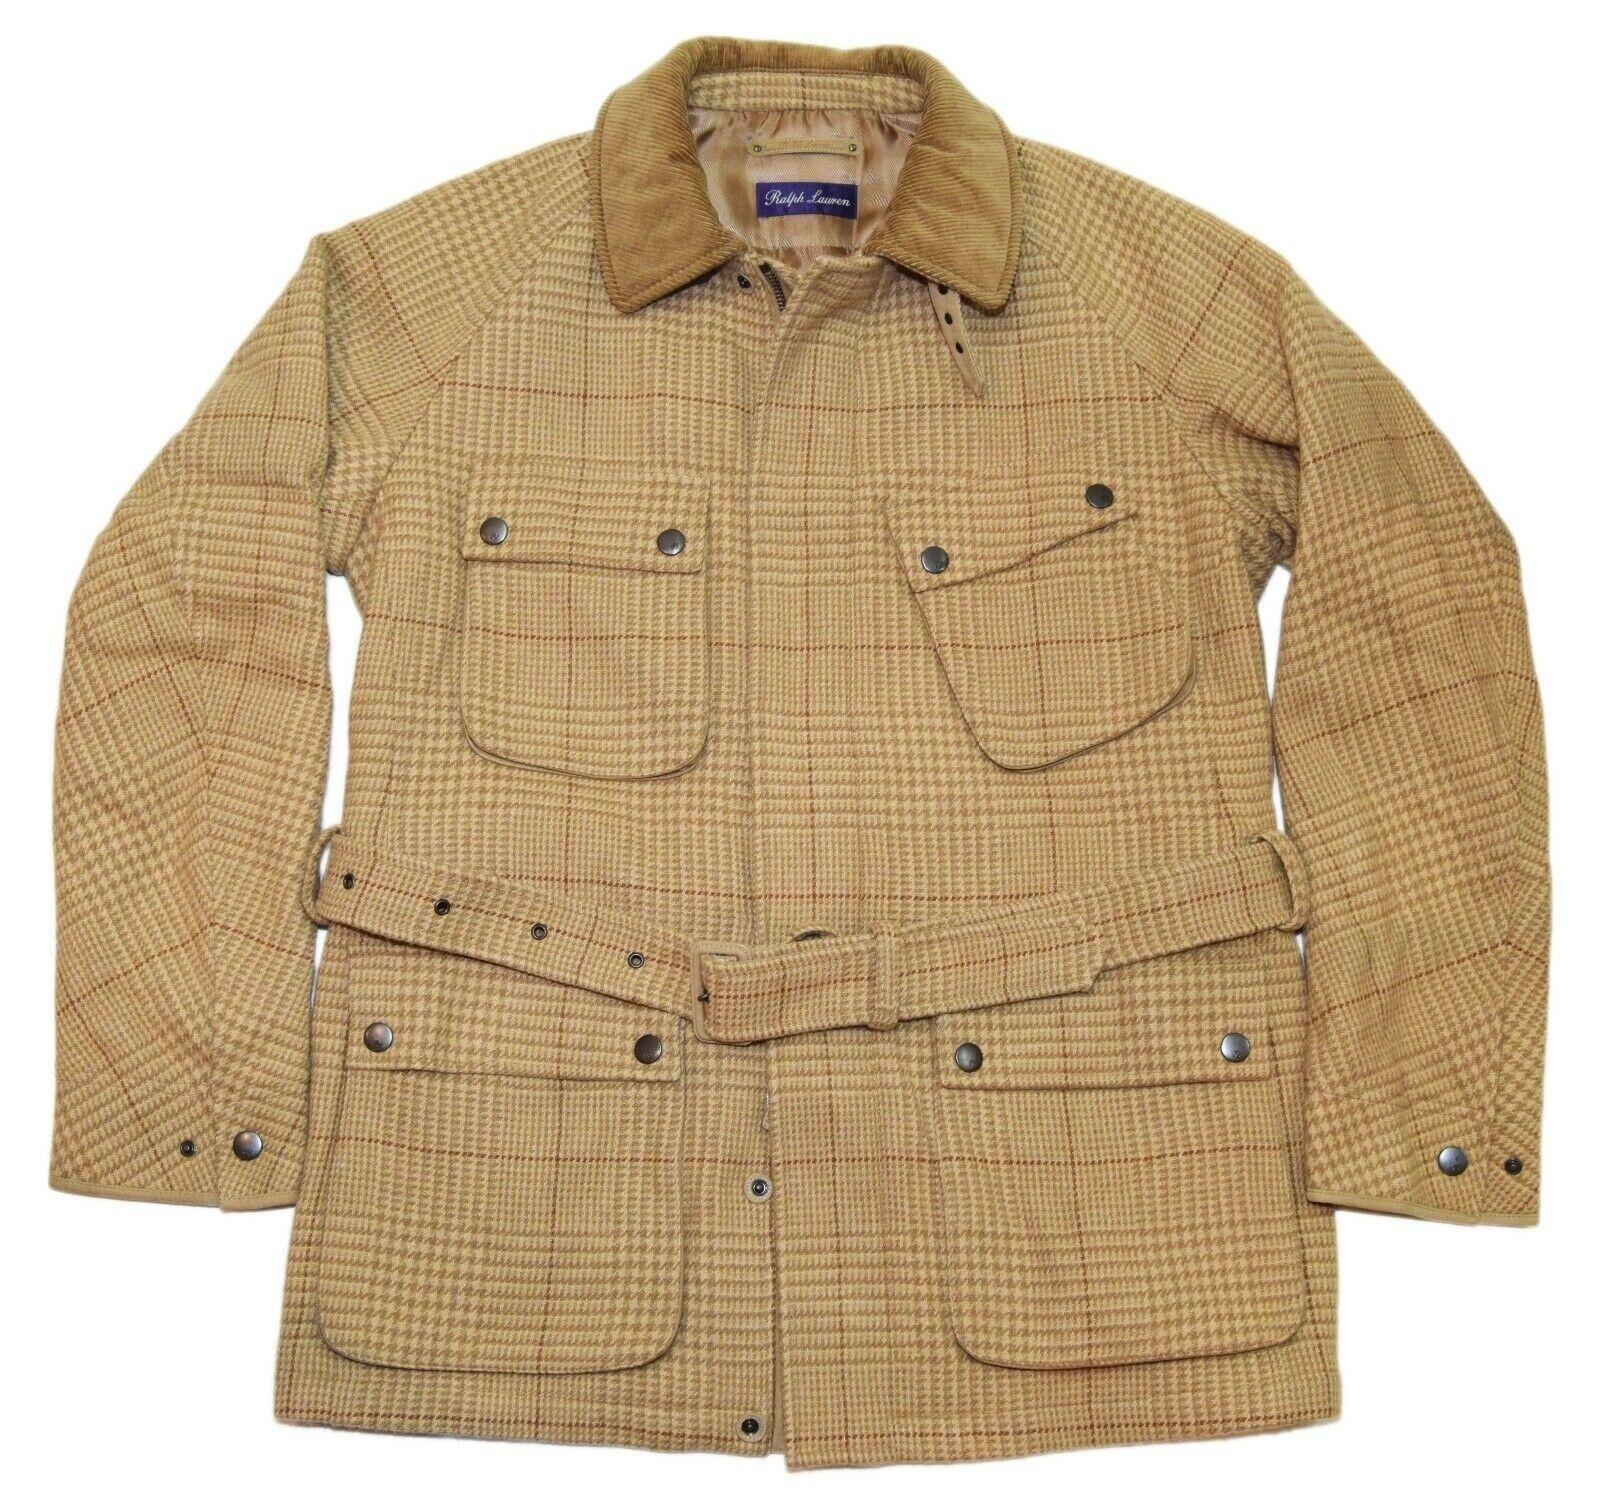 3295-ralph-lauren-purple-label-mens-wool-jacket-plaid-coat-brown-beige-large